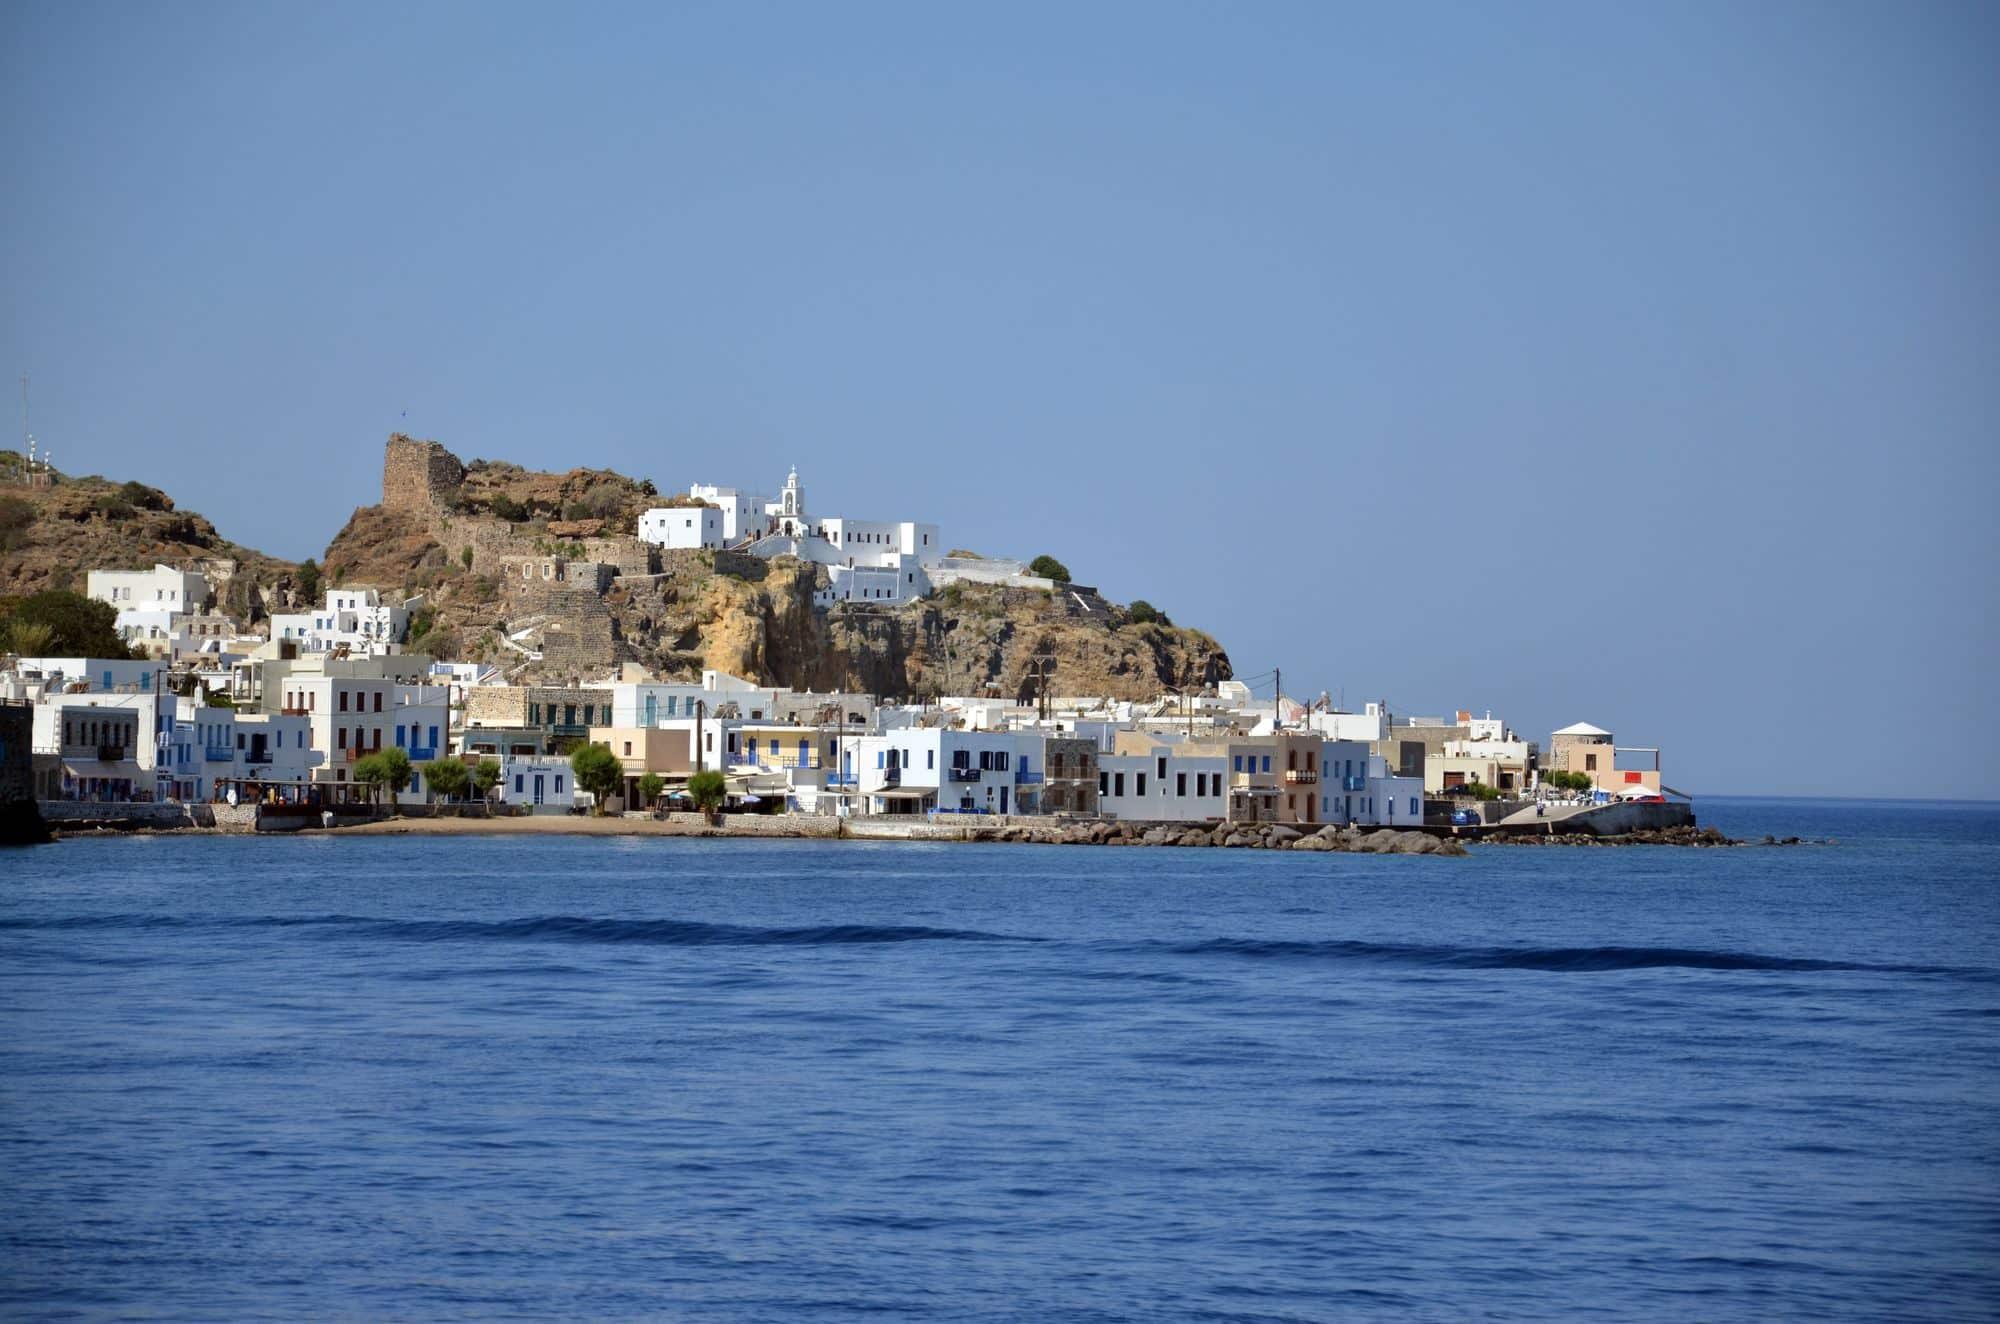 Mandraki Village in Nisyros